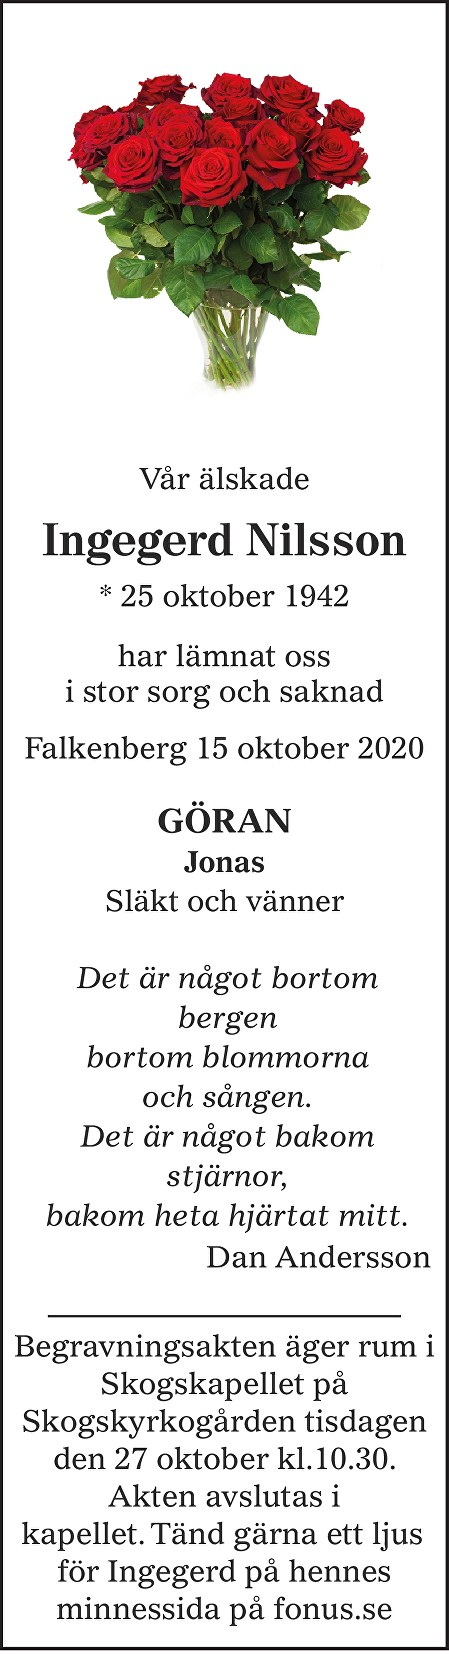 Ingegerd Nilsson Death notice